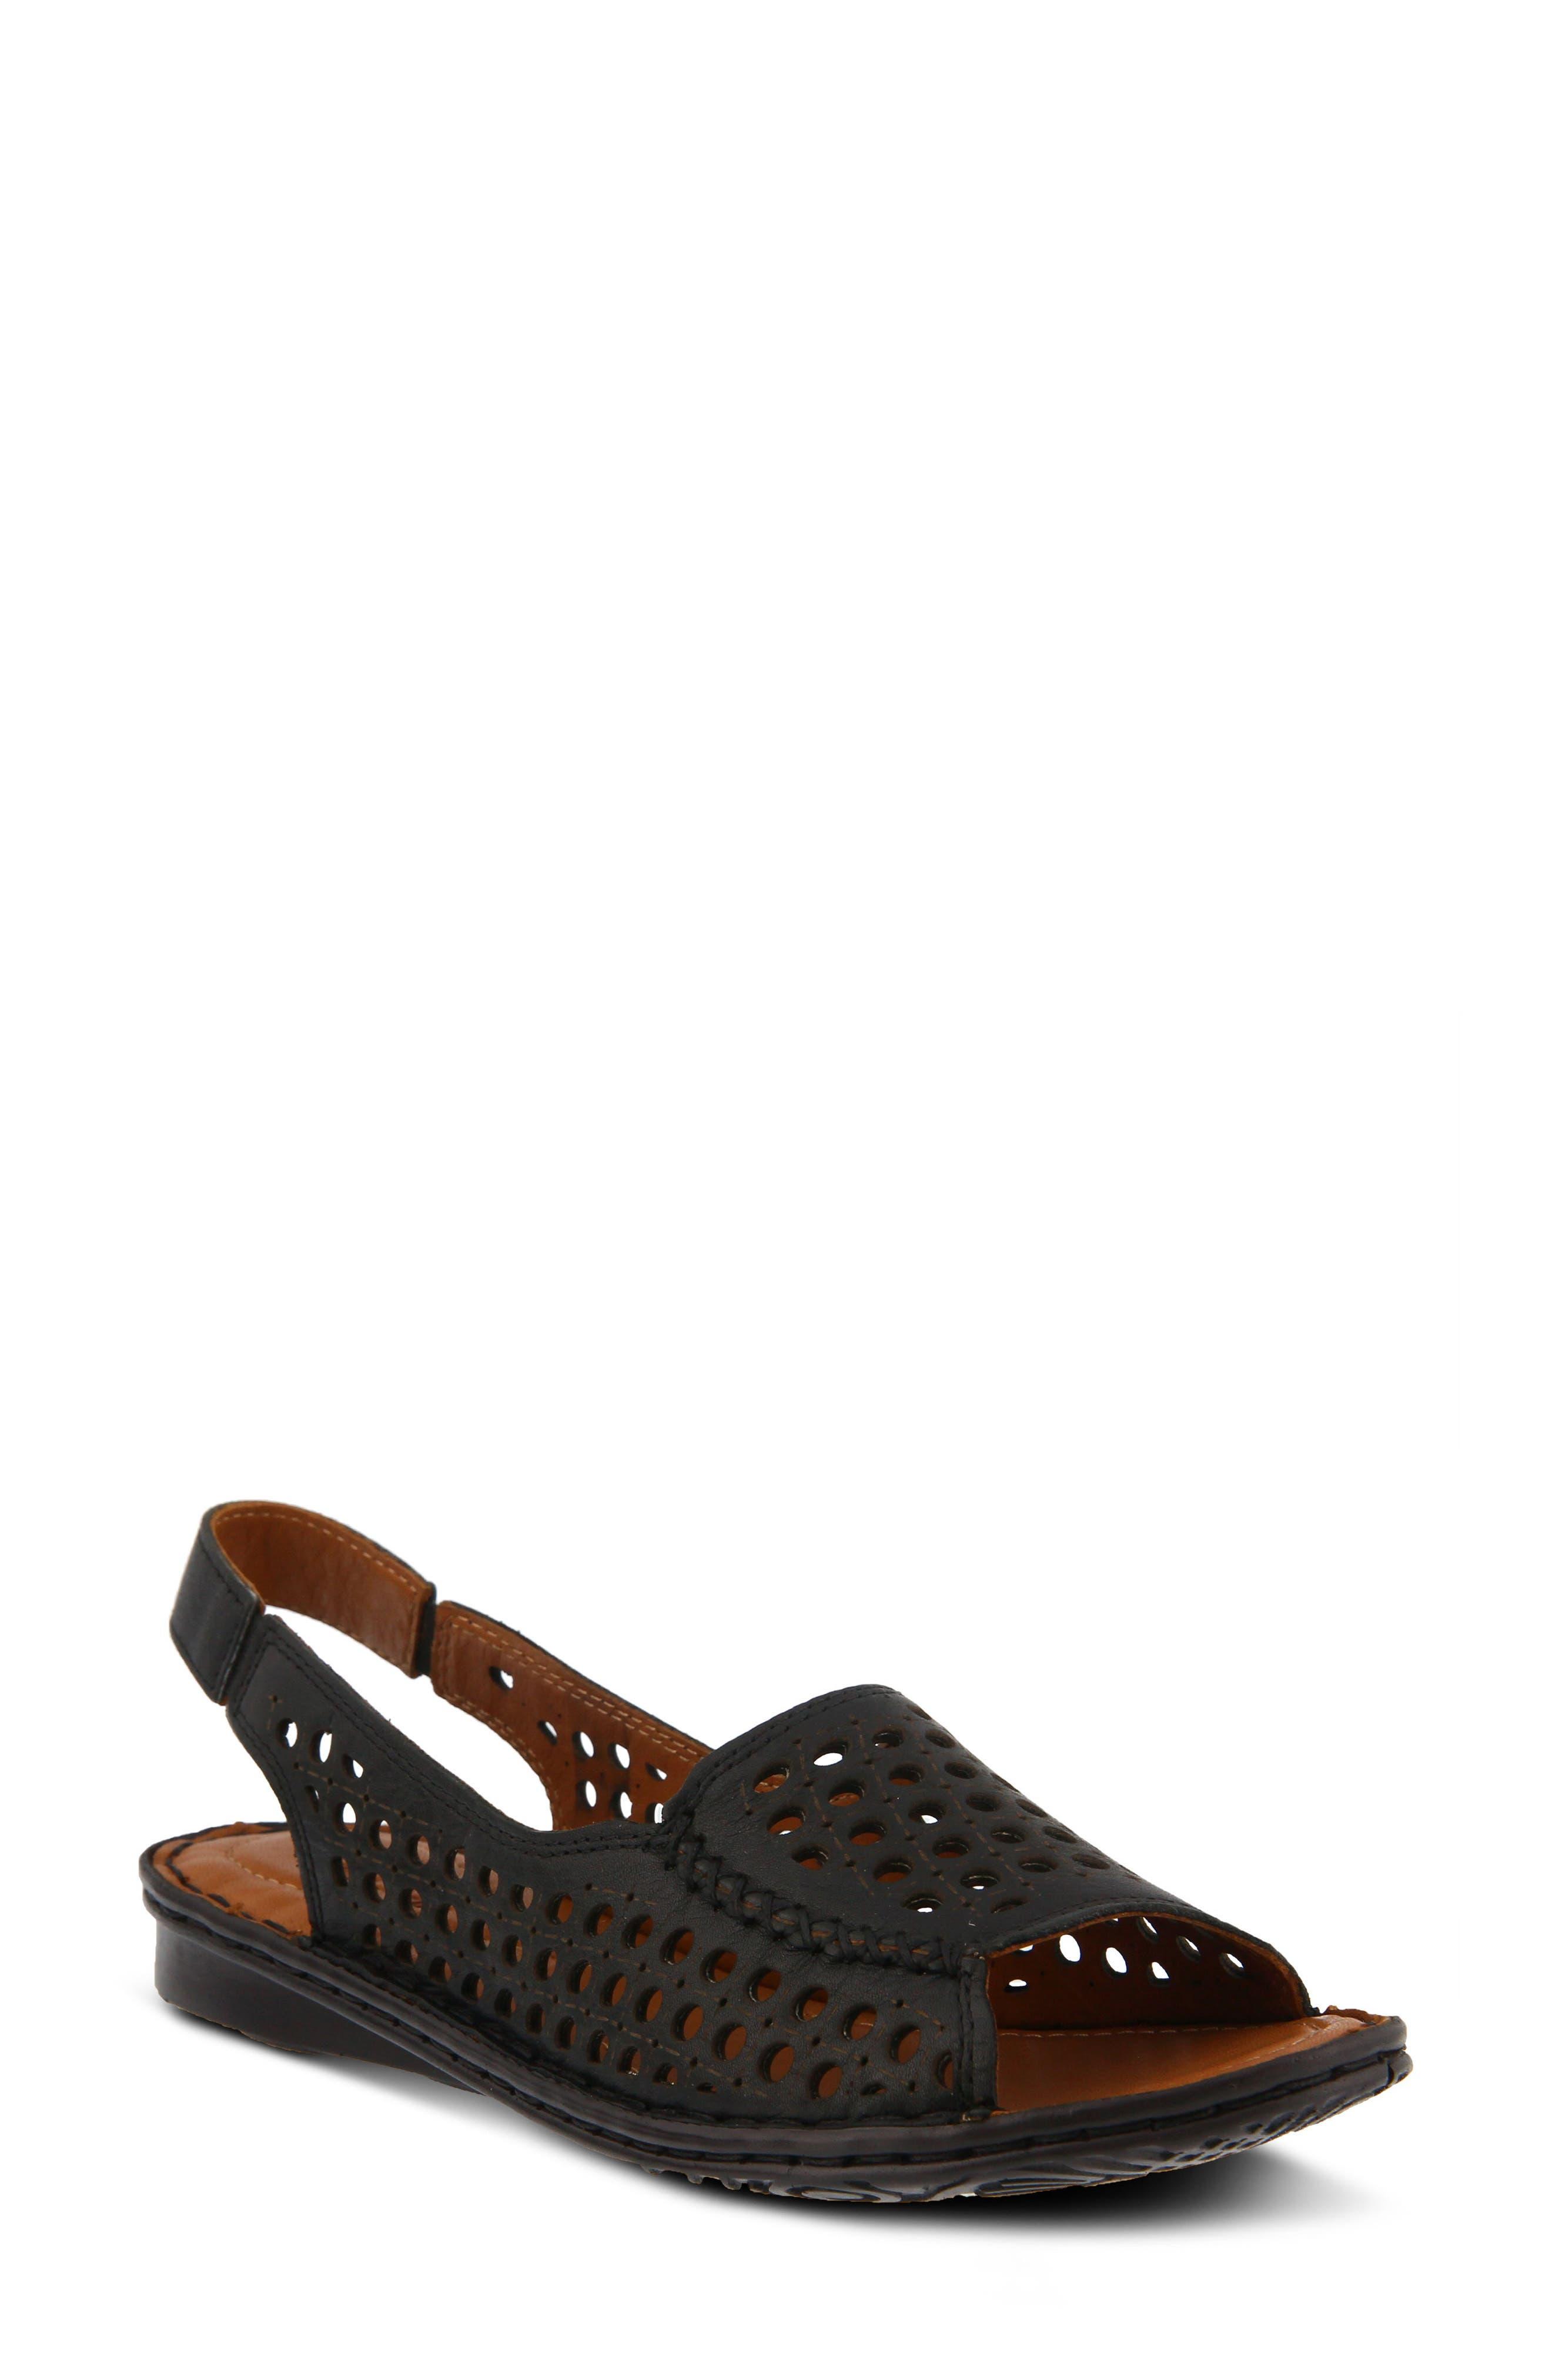 Jordana Slingback Sandal, Main, color, BLACK LEATHER